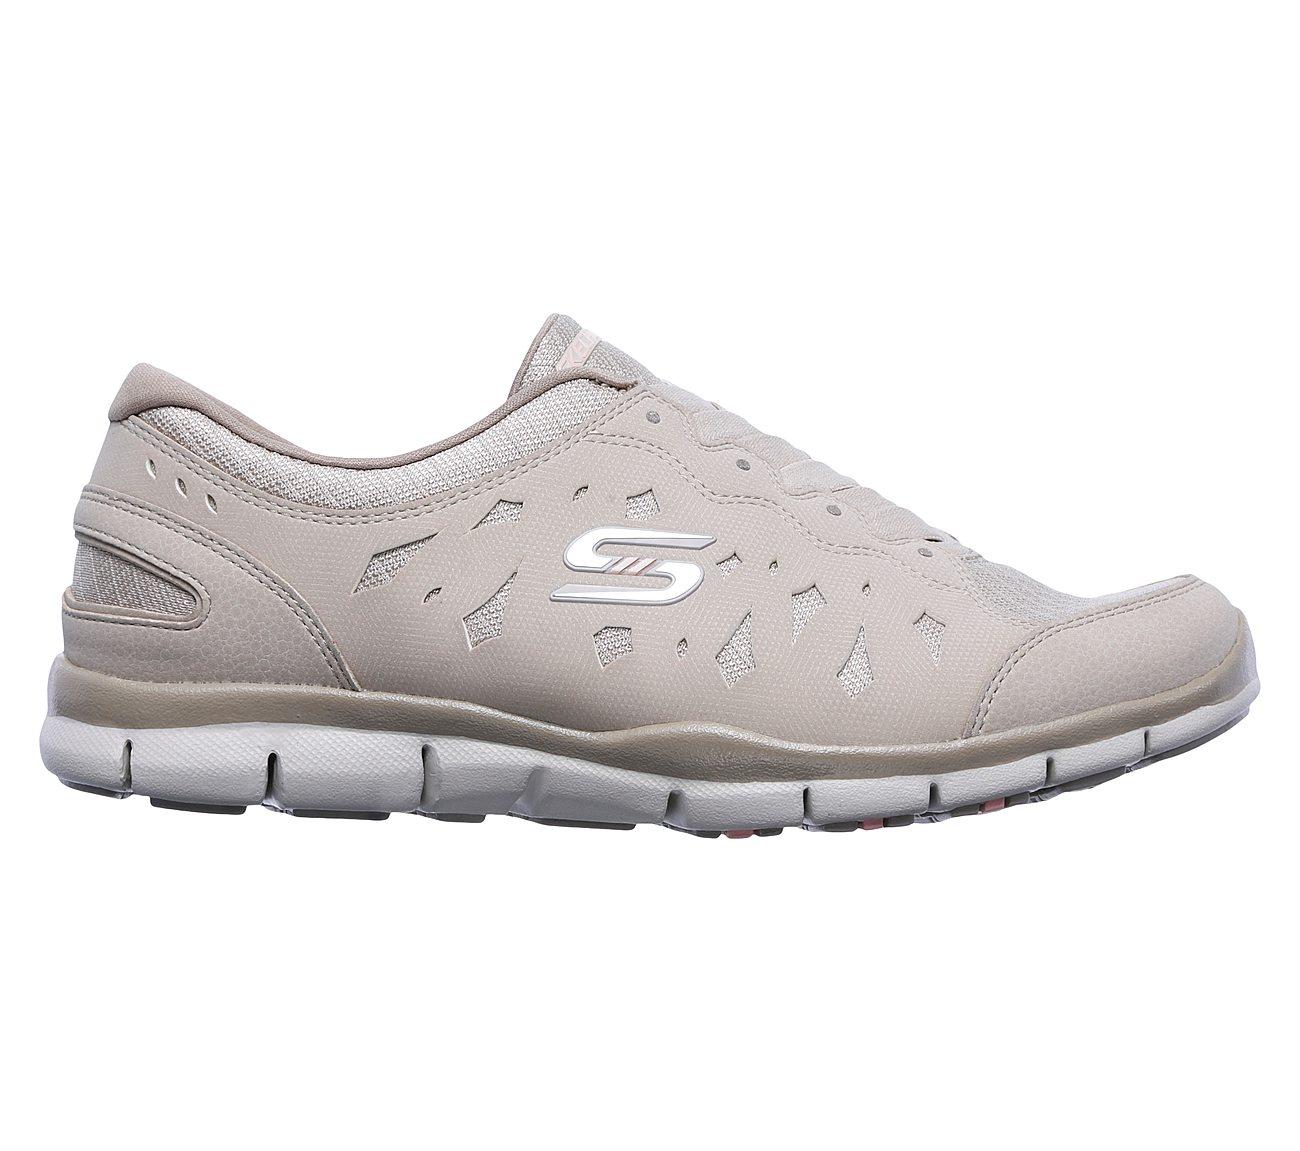 Skechers Gratis Light Heart Women Sneakers : Casual shoes